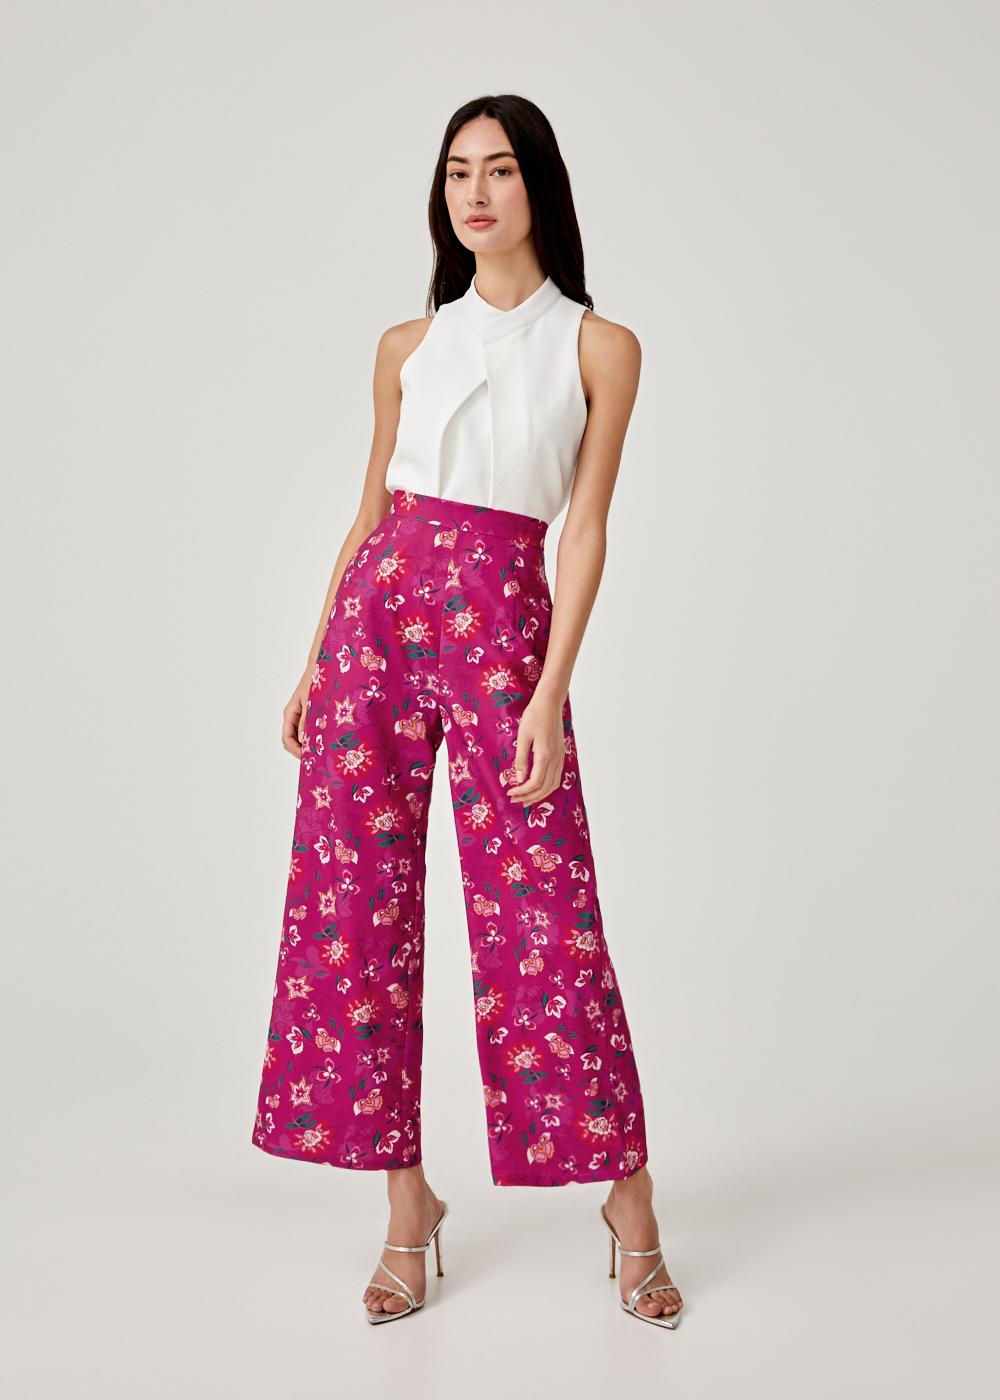 Luvenia Straight Leg Pants in Jade Blossom